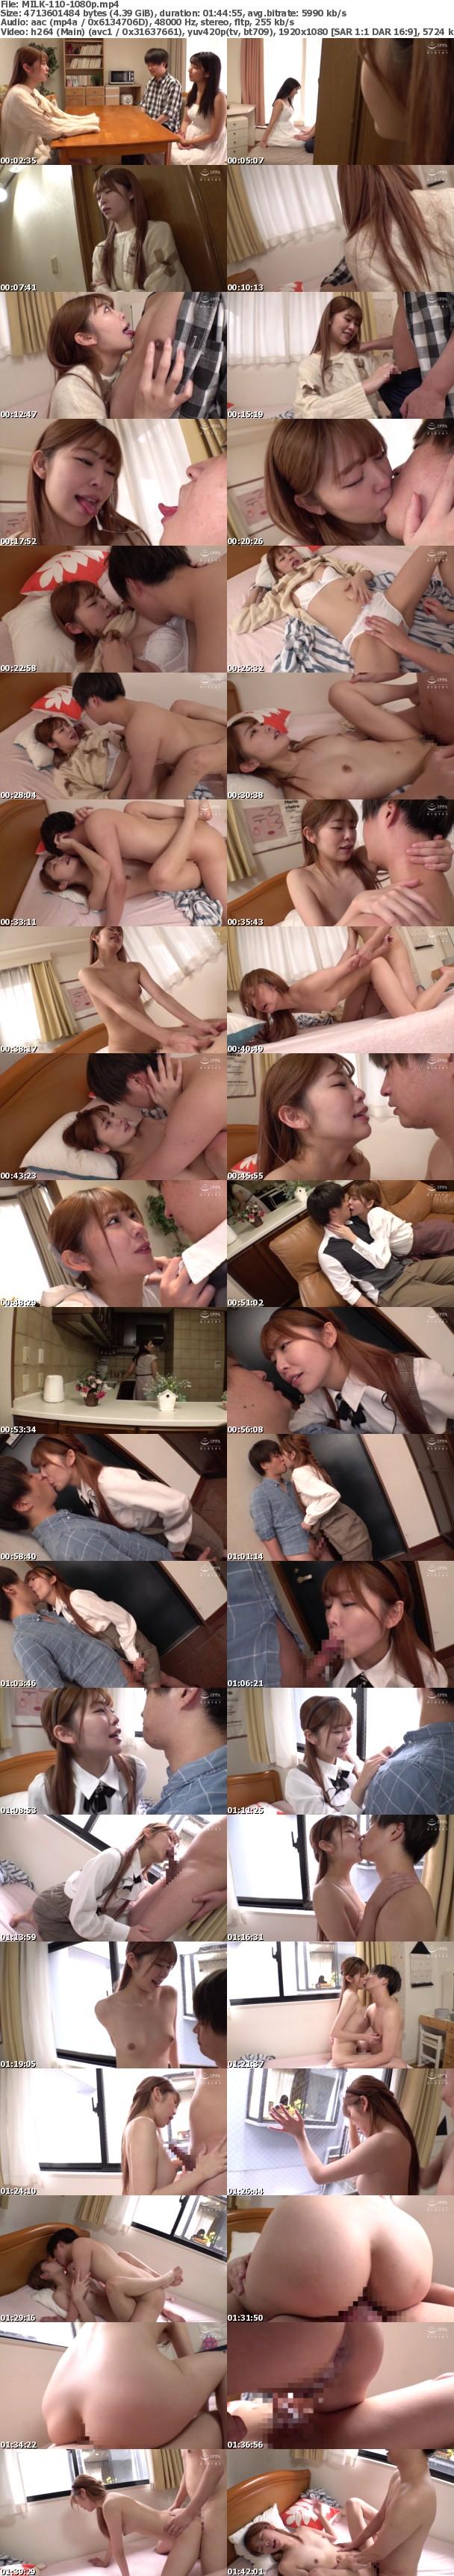 (Full HD) MILK-110 姉の彼氏をねっとりベロチュウで誘惑 あざとい甘えん坊キス魔 森日向子